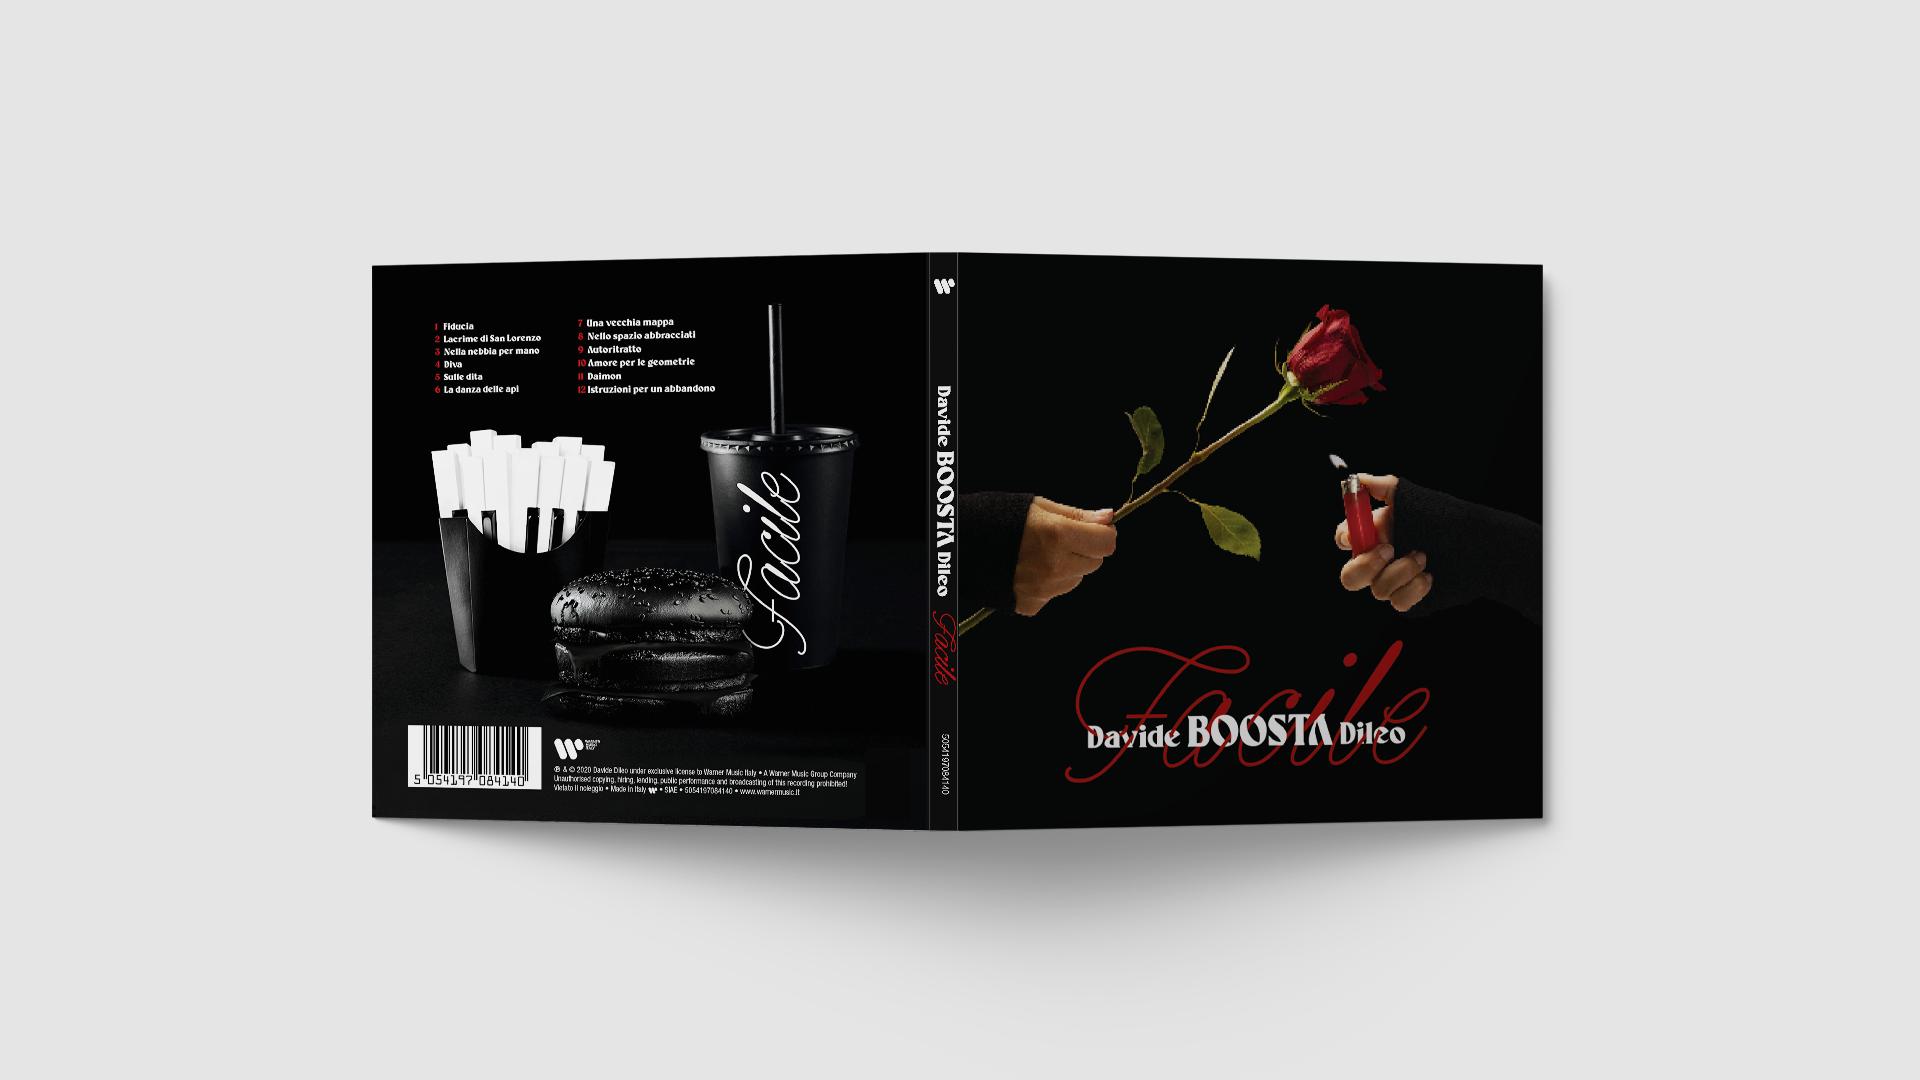 1 boosta davide dileo subsonica valentina ciandrini ciandreamy packaging